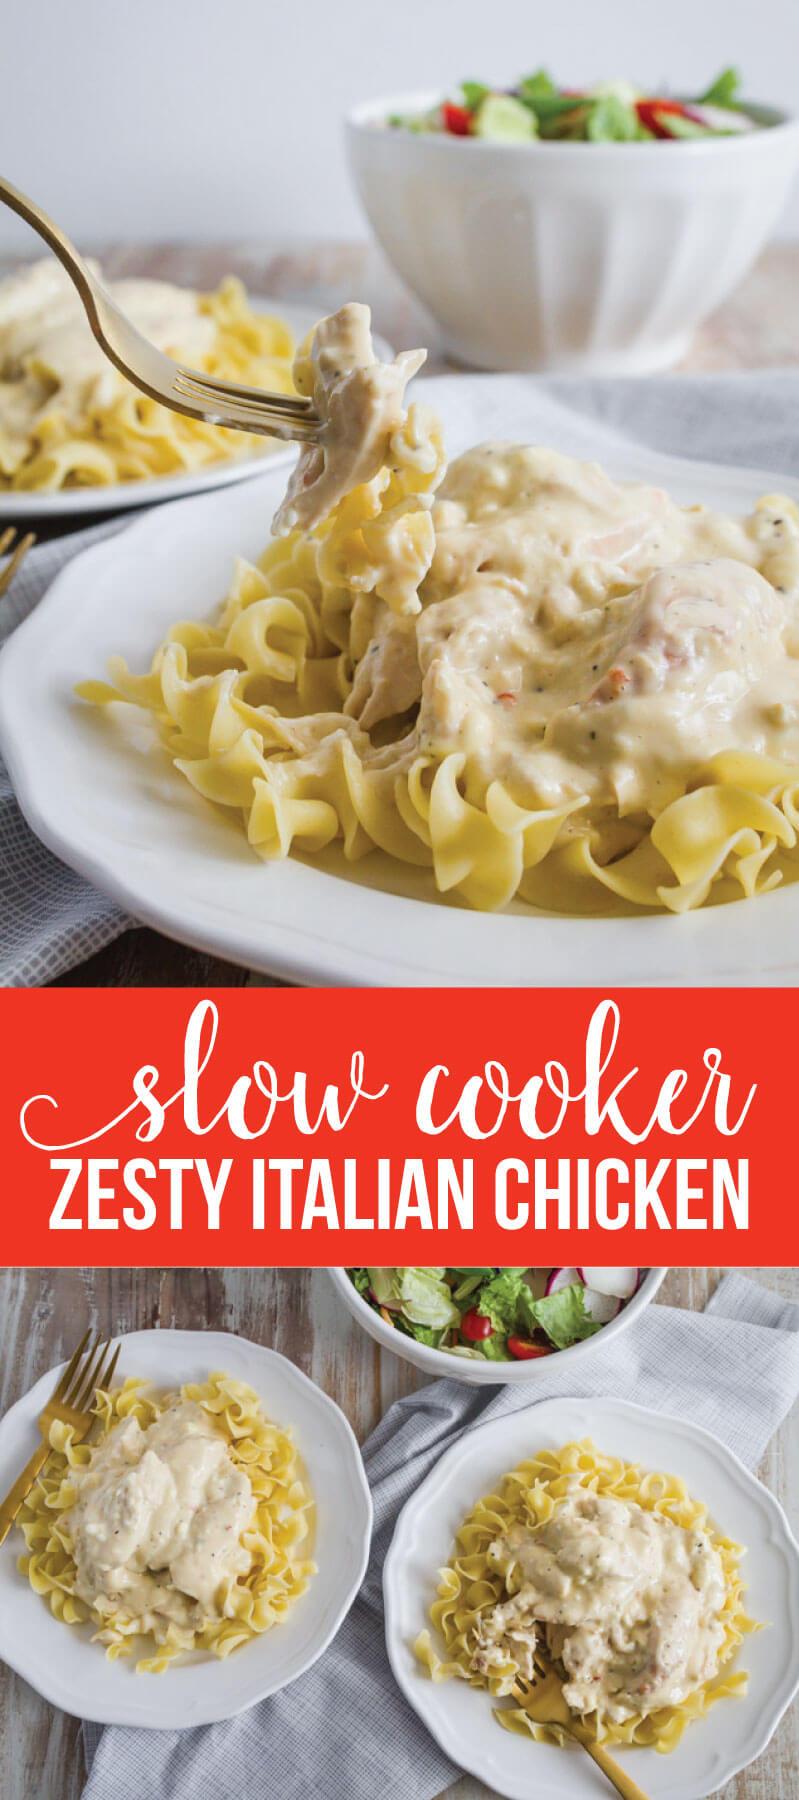 Slow Cooker Zesty Italian Chicken - one of our family favorites. www.thirtyhandmadedays.com